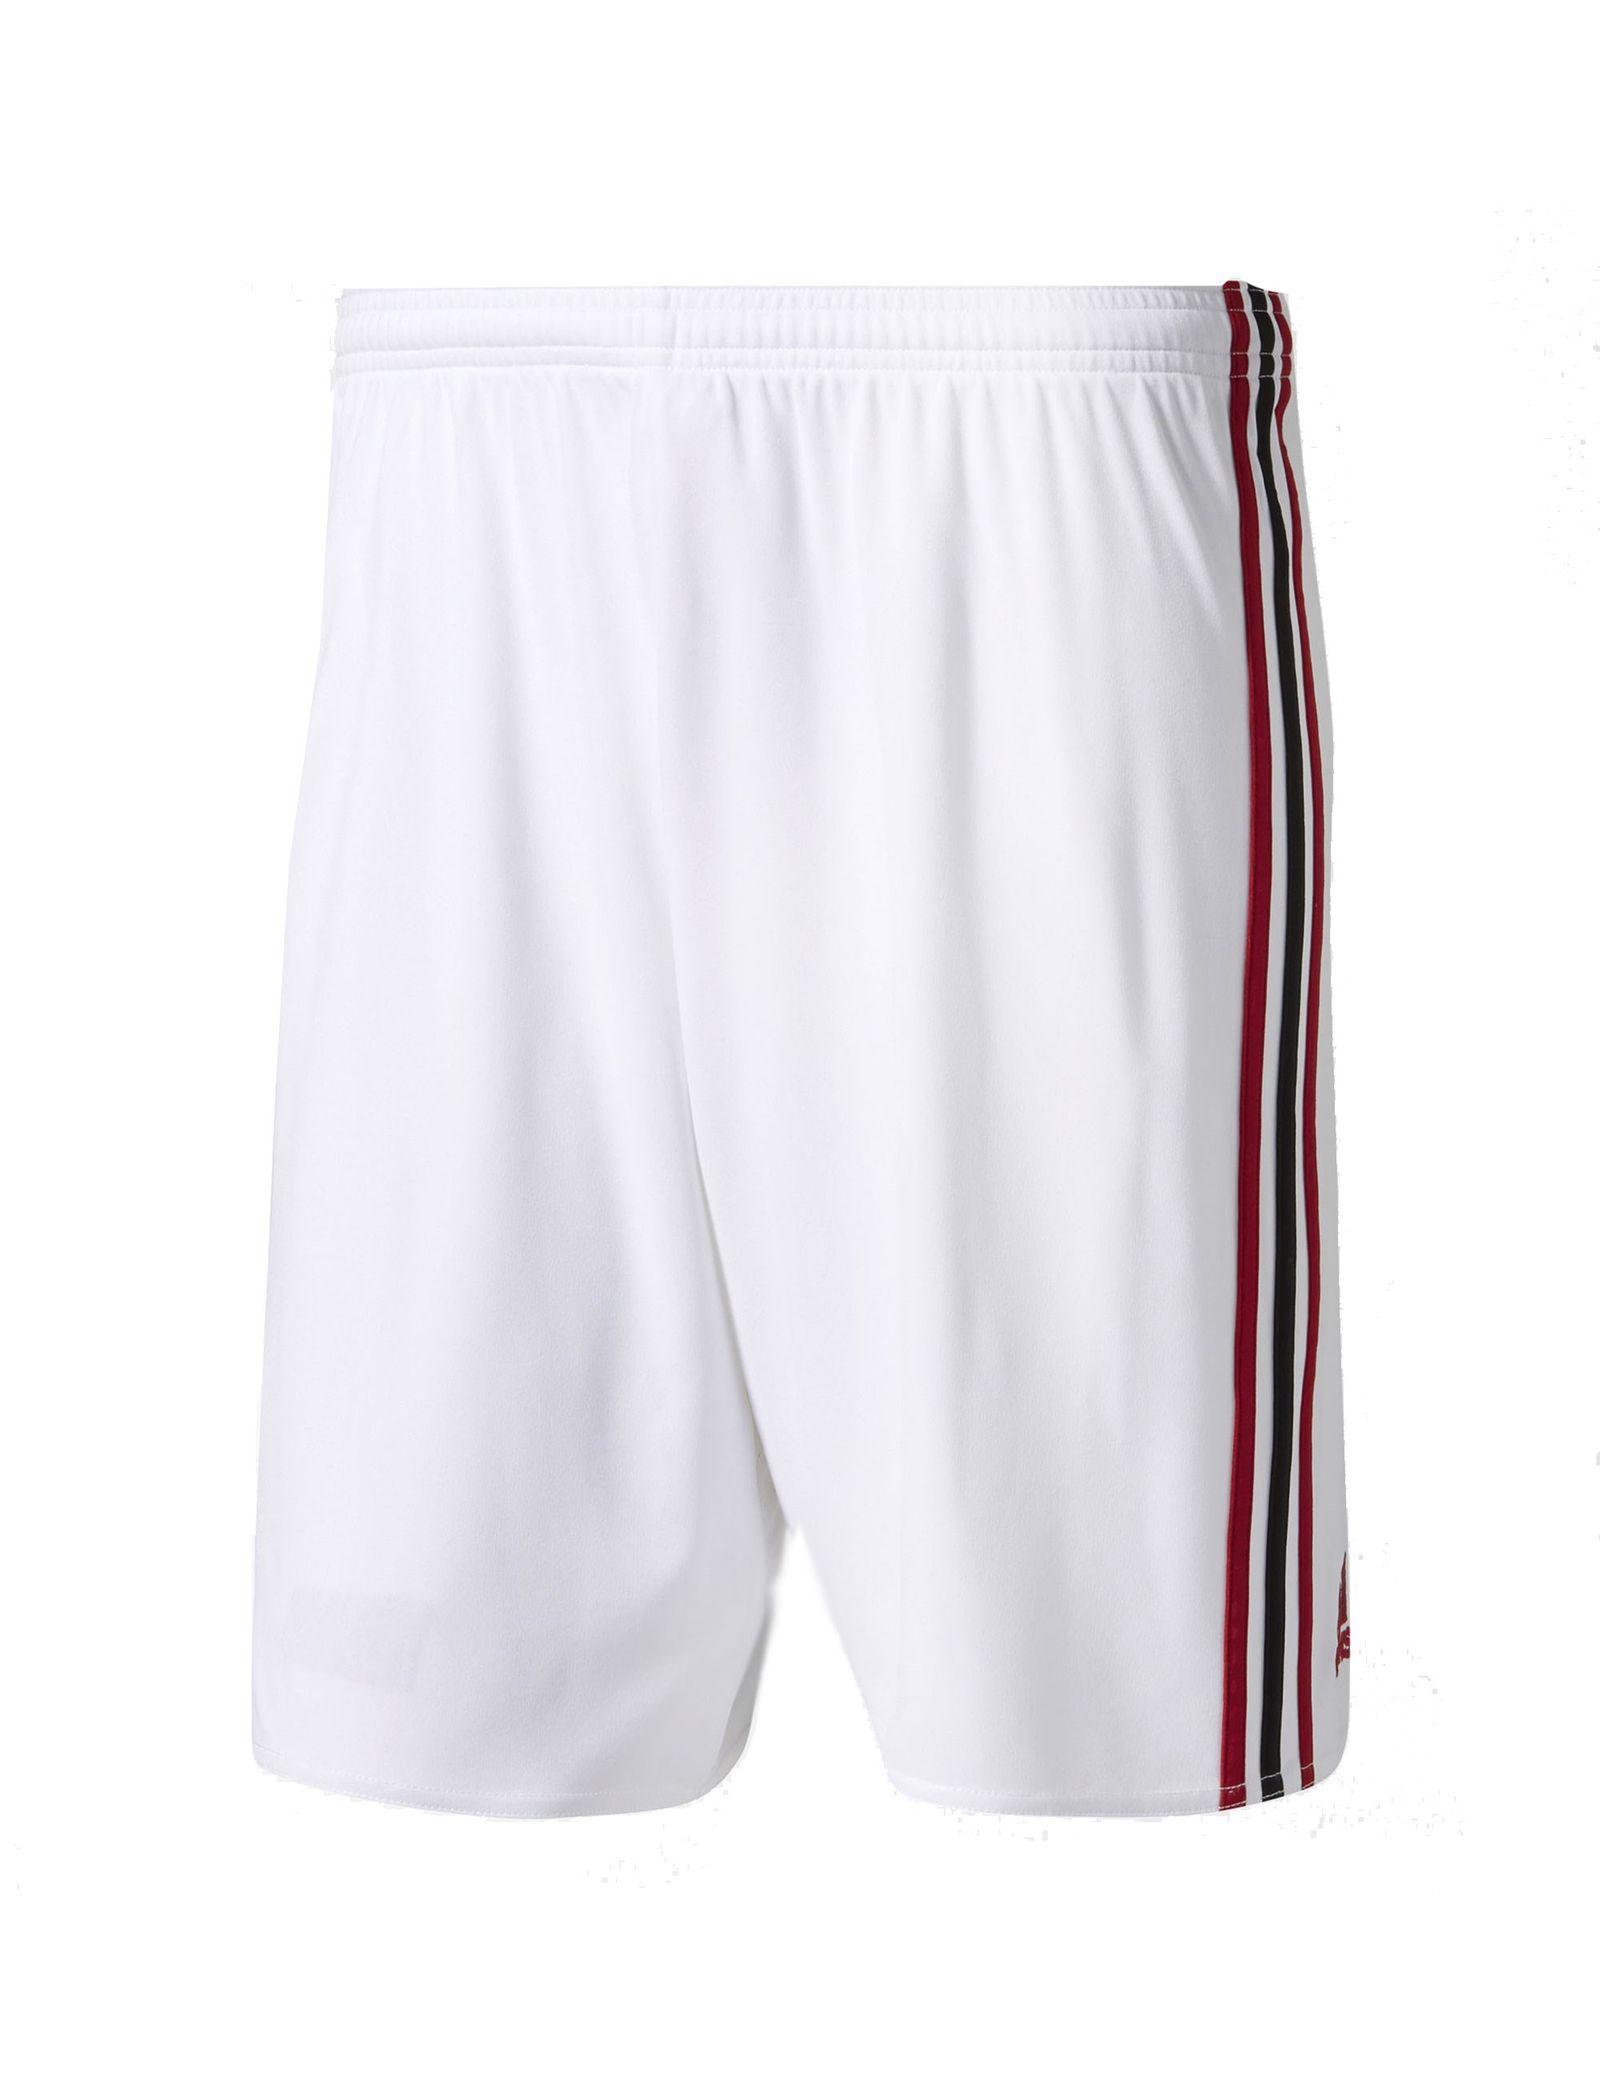 شلوارک فوتبال تیم  AC Milan Replica - آدیداس - سفيد   - 1